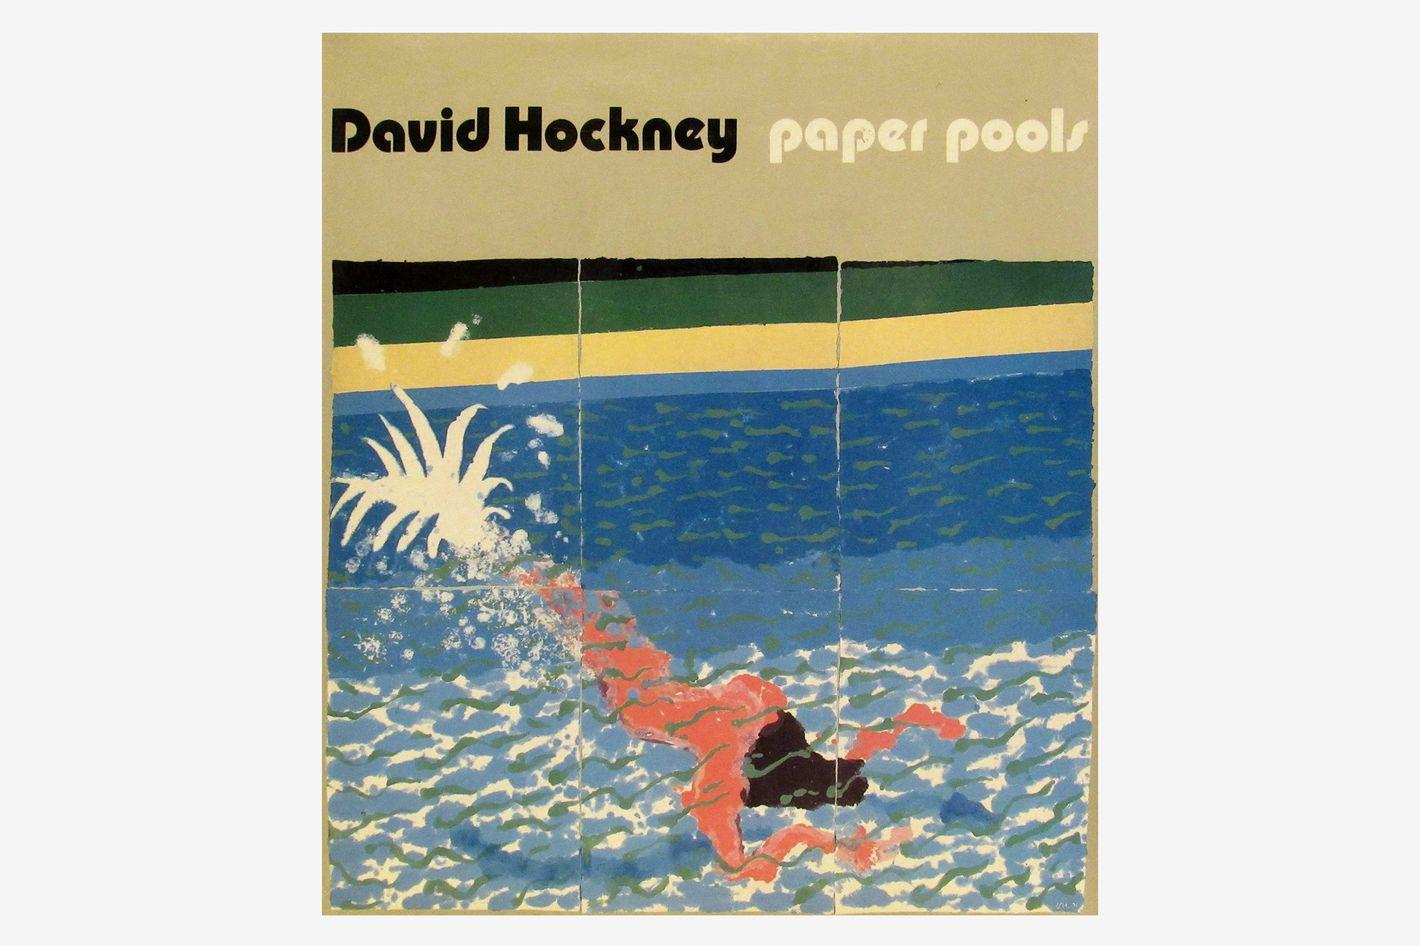 Paper Pools